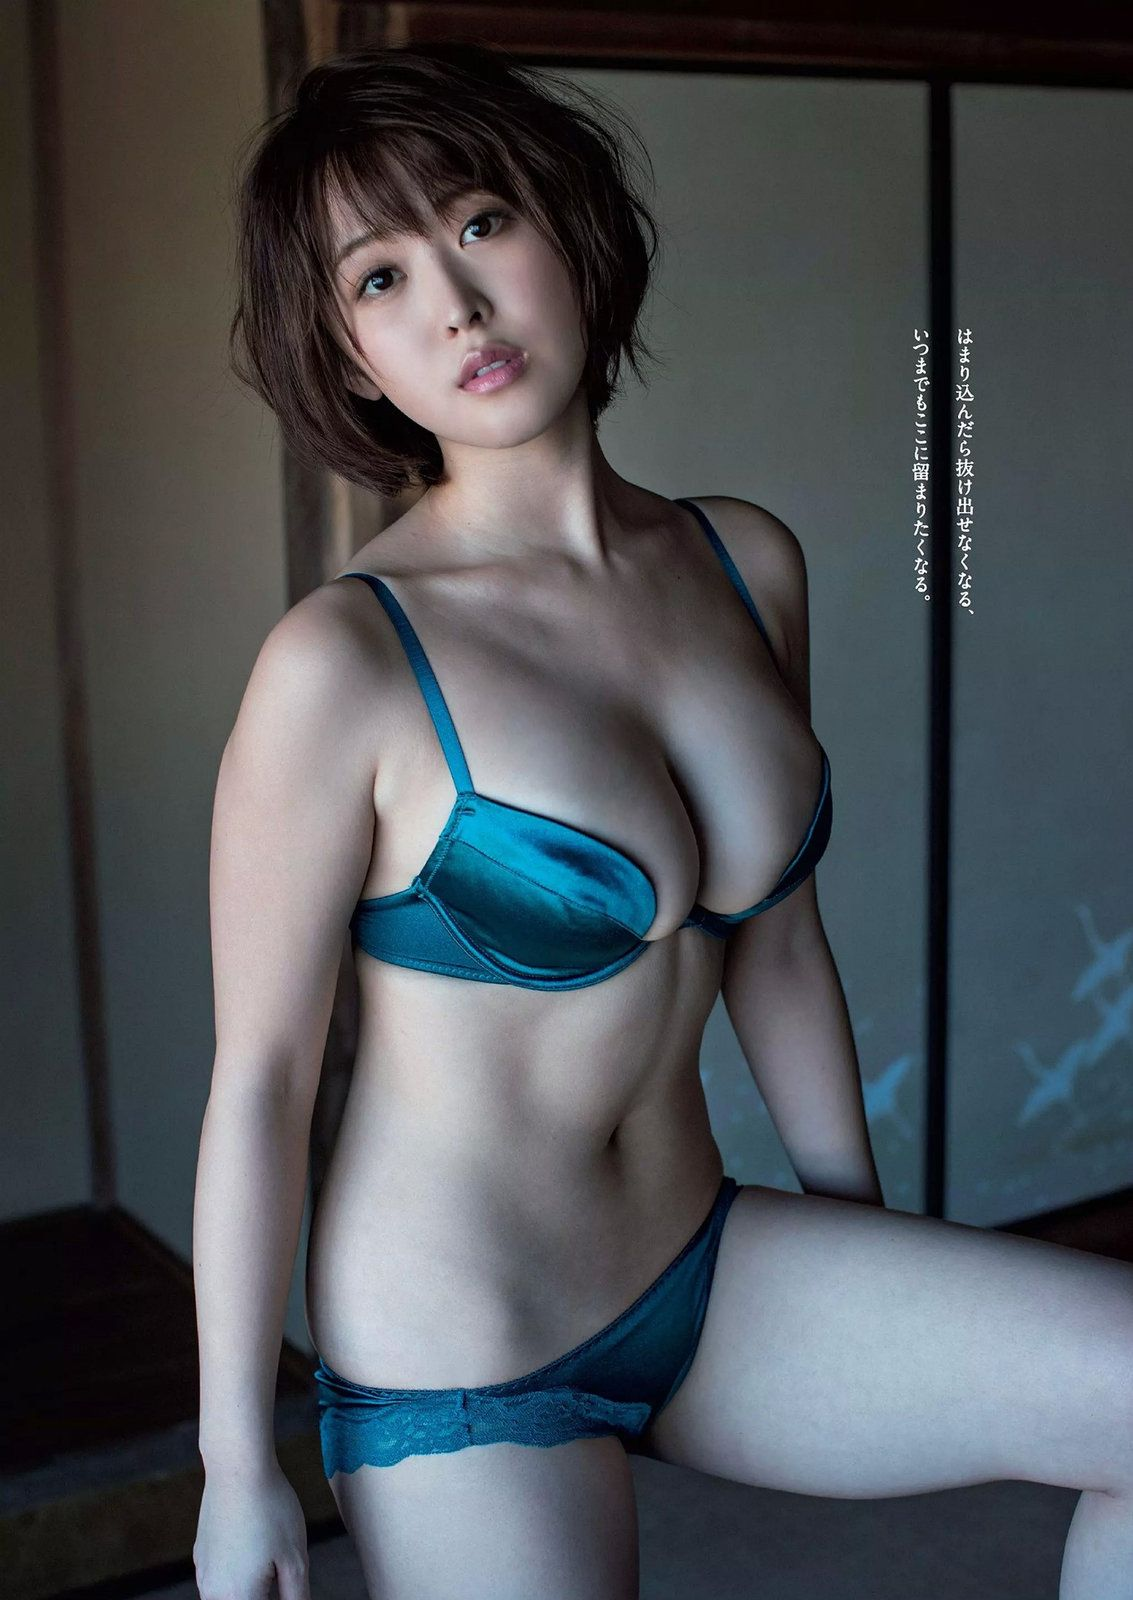 CORINNE: Asian girl panty hole